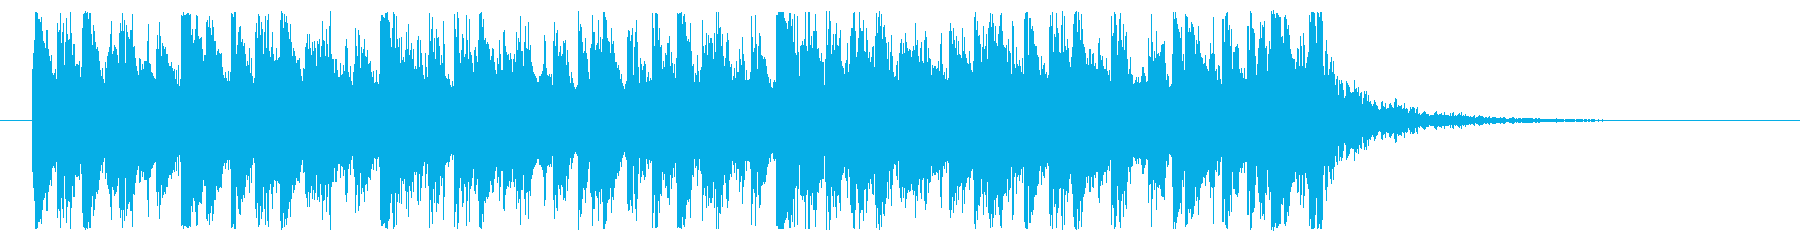 IT企業系アタックジングルの再生済みの波形